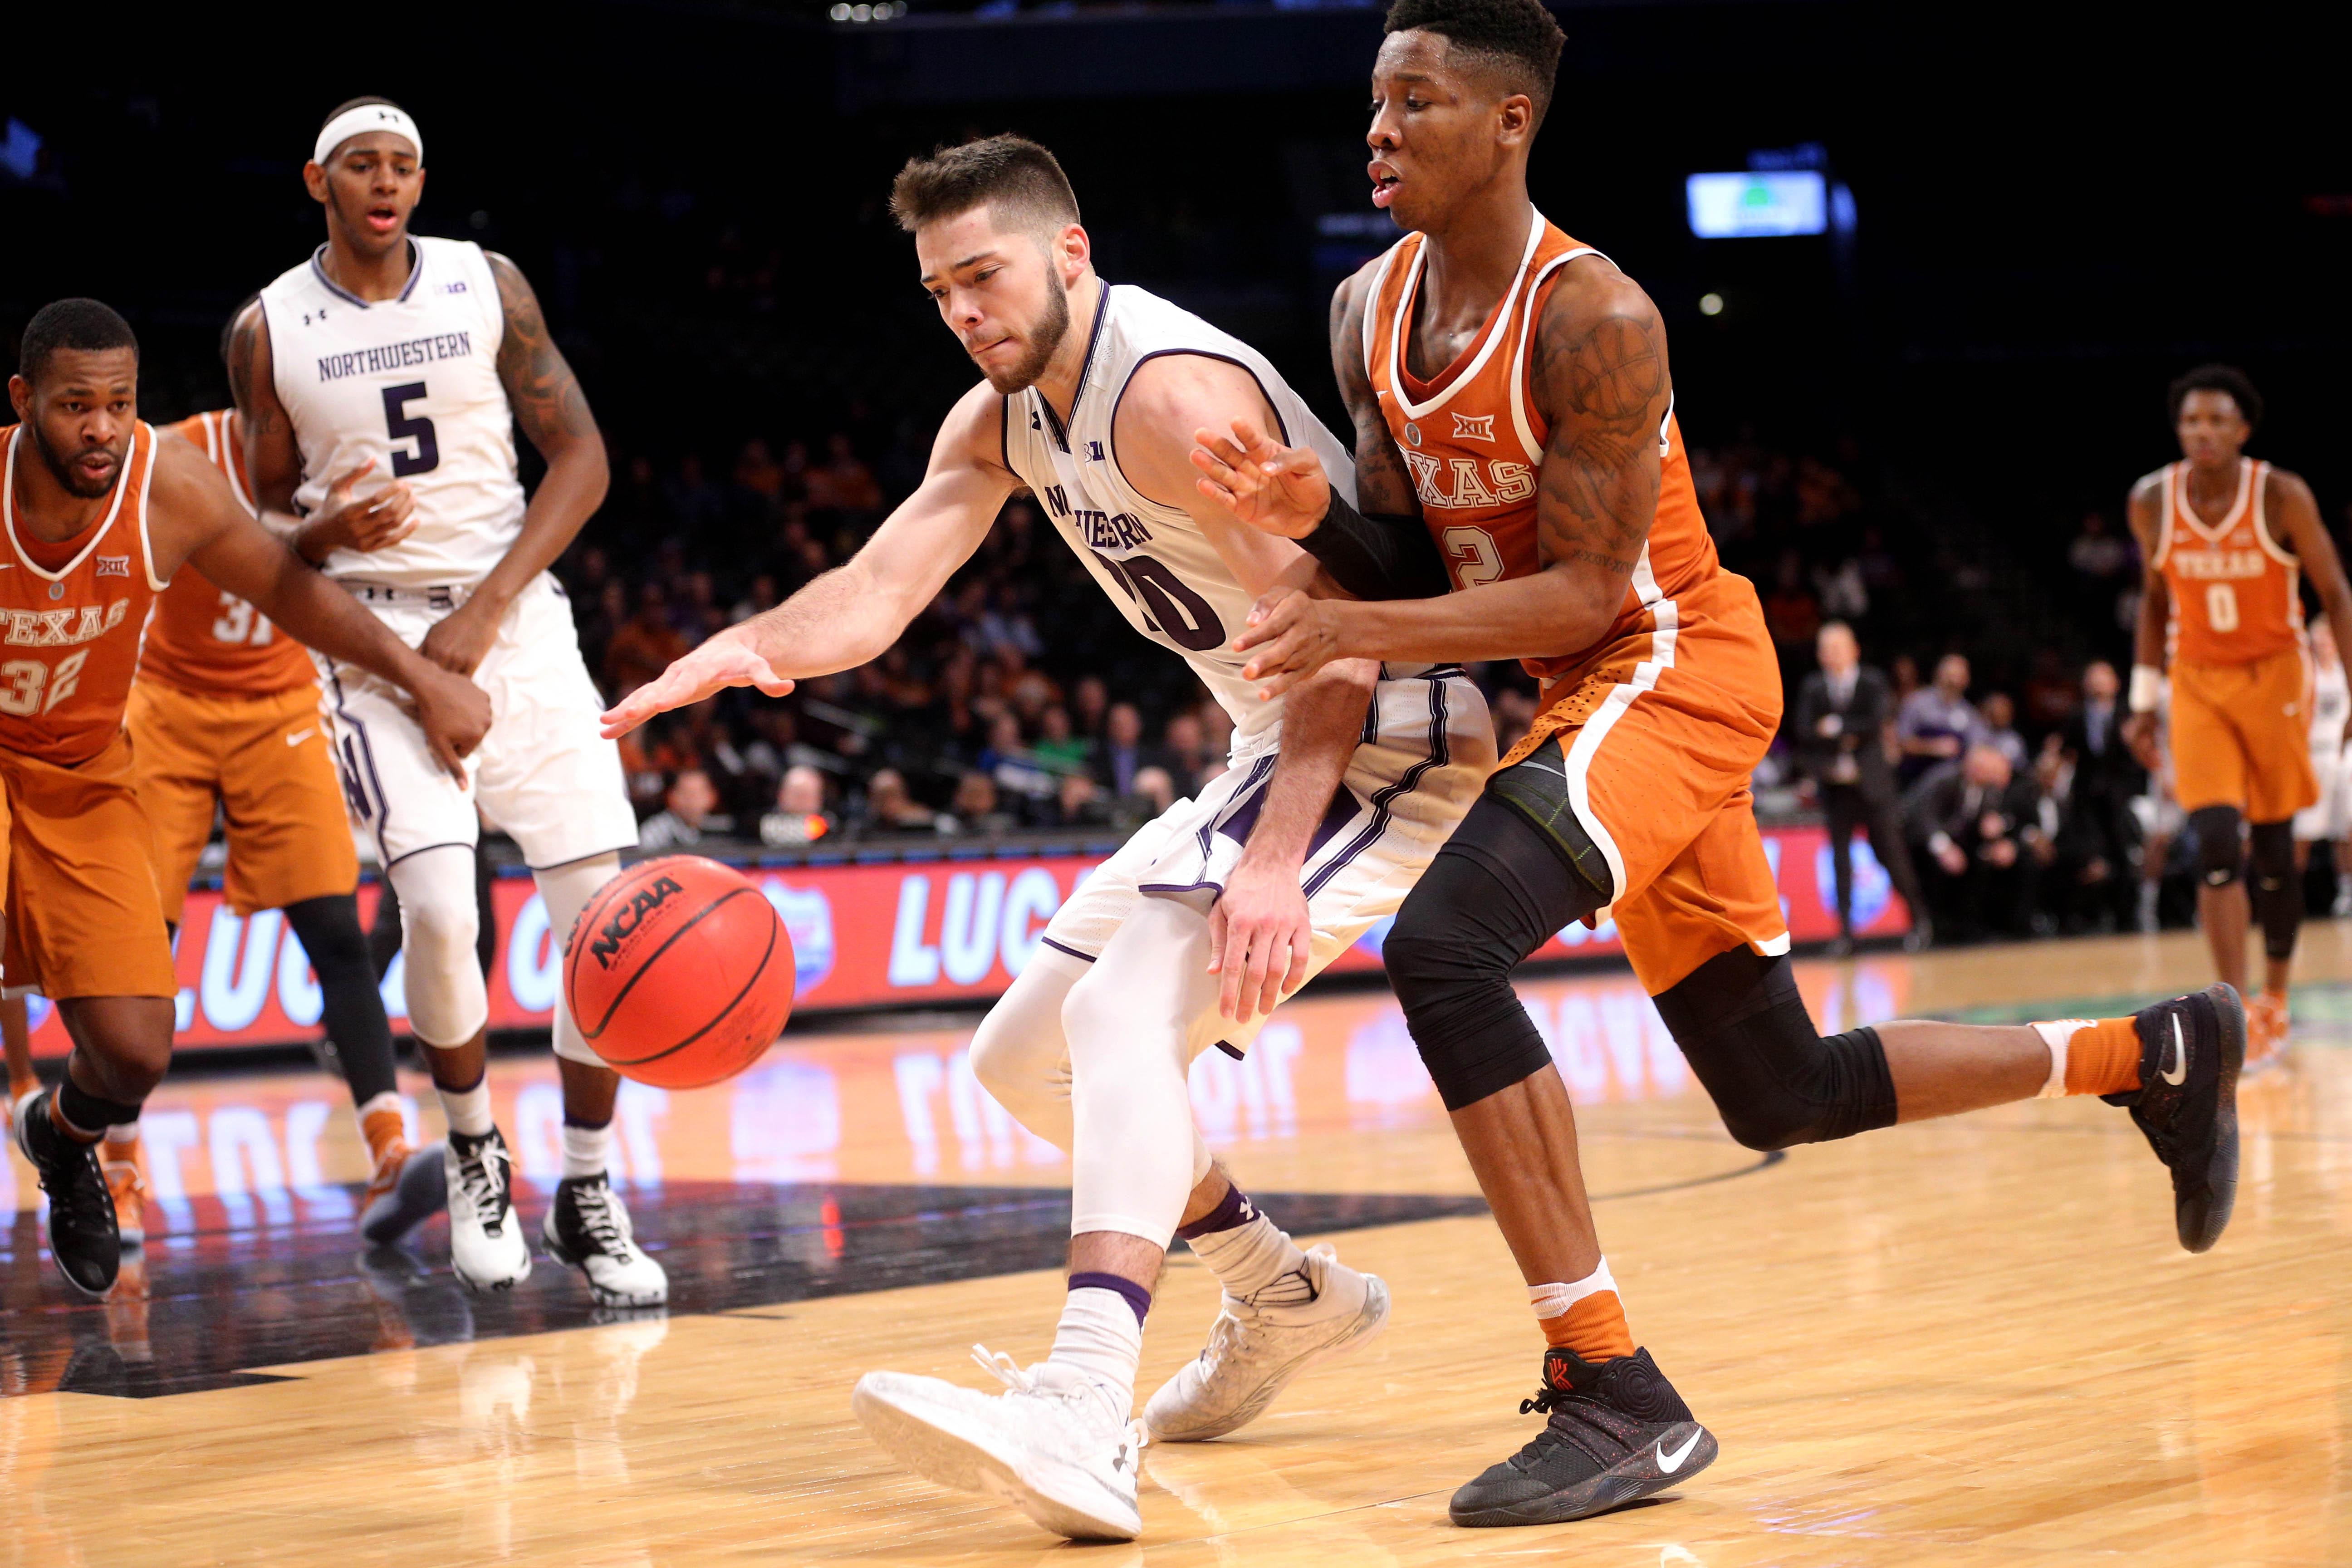 NCAA Basketball: Legends Classic-Texas vs Northwestern